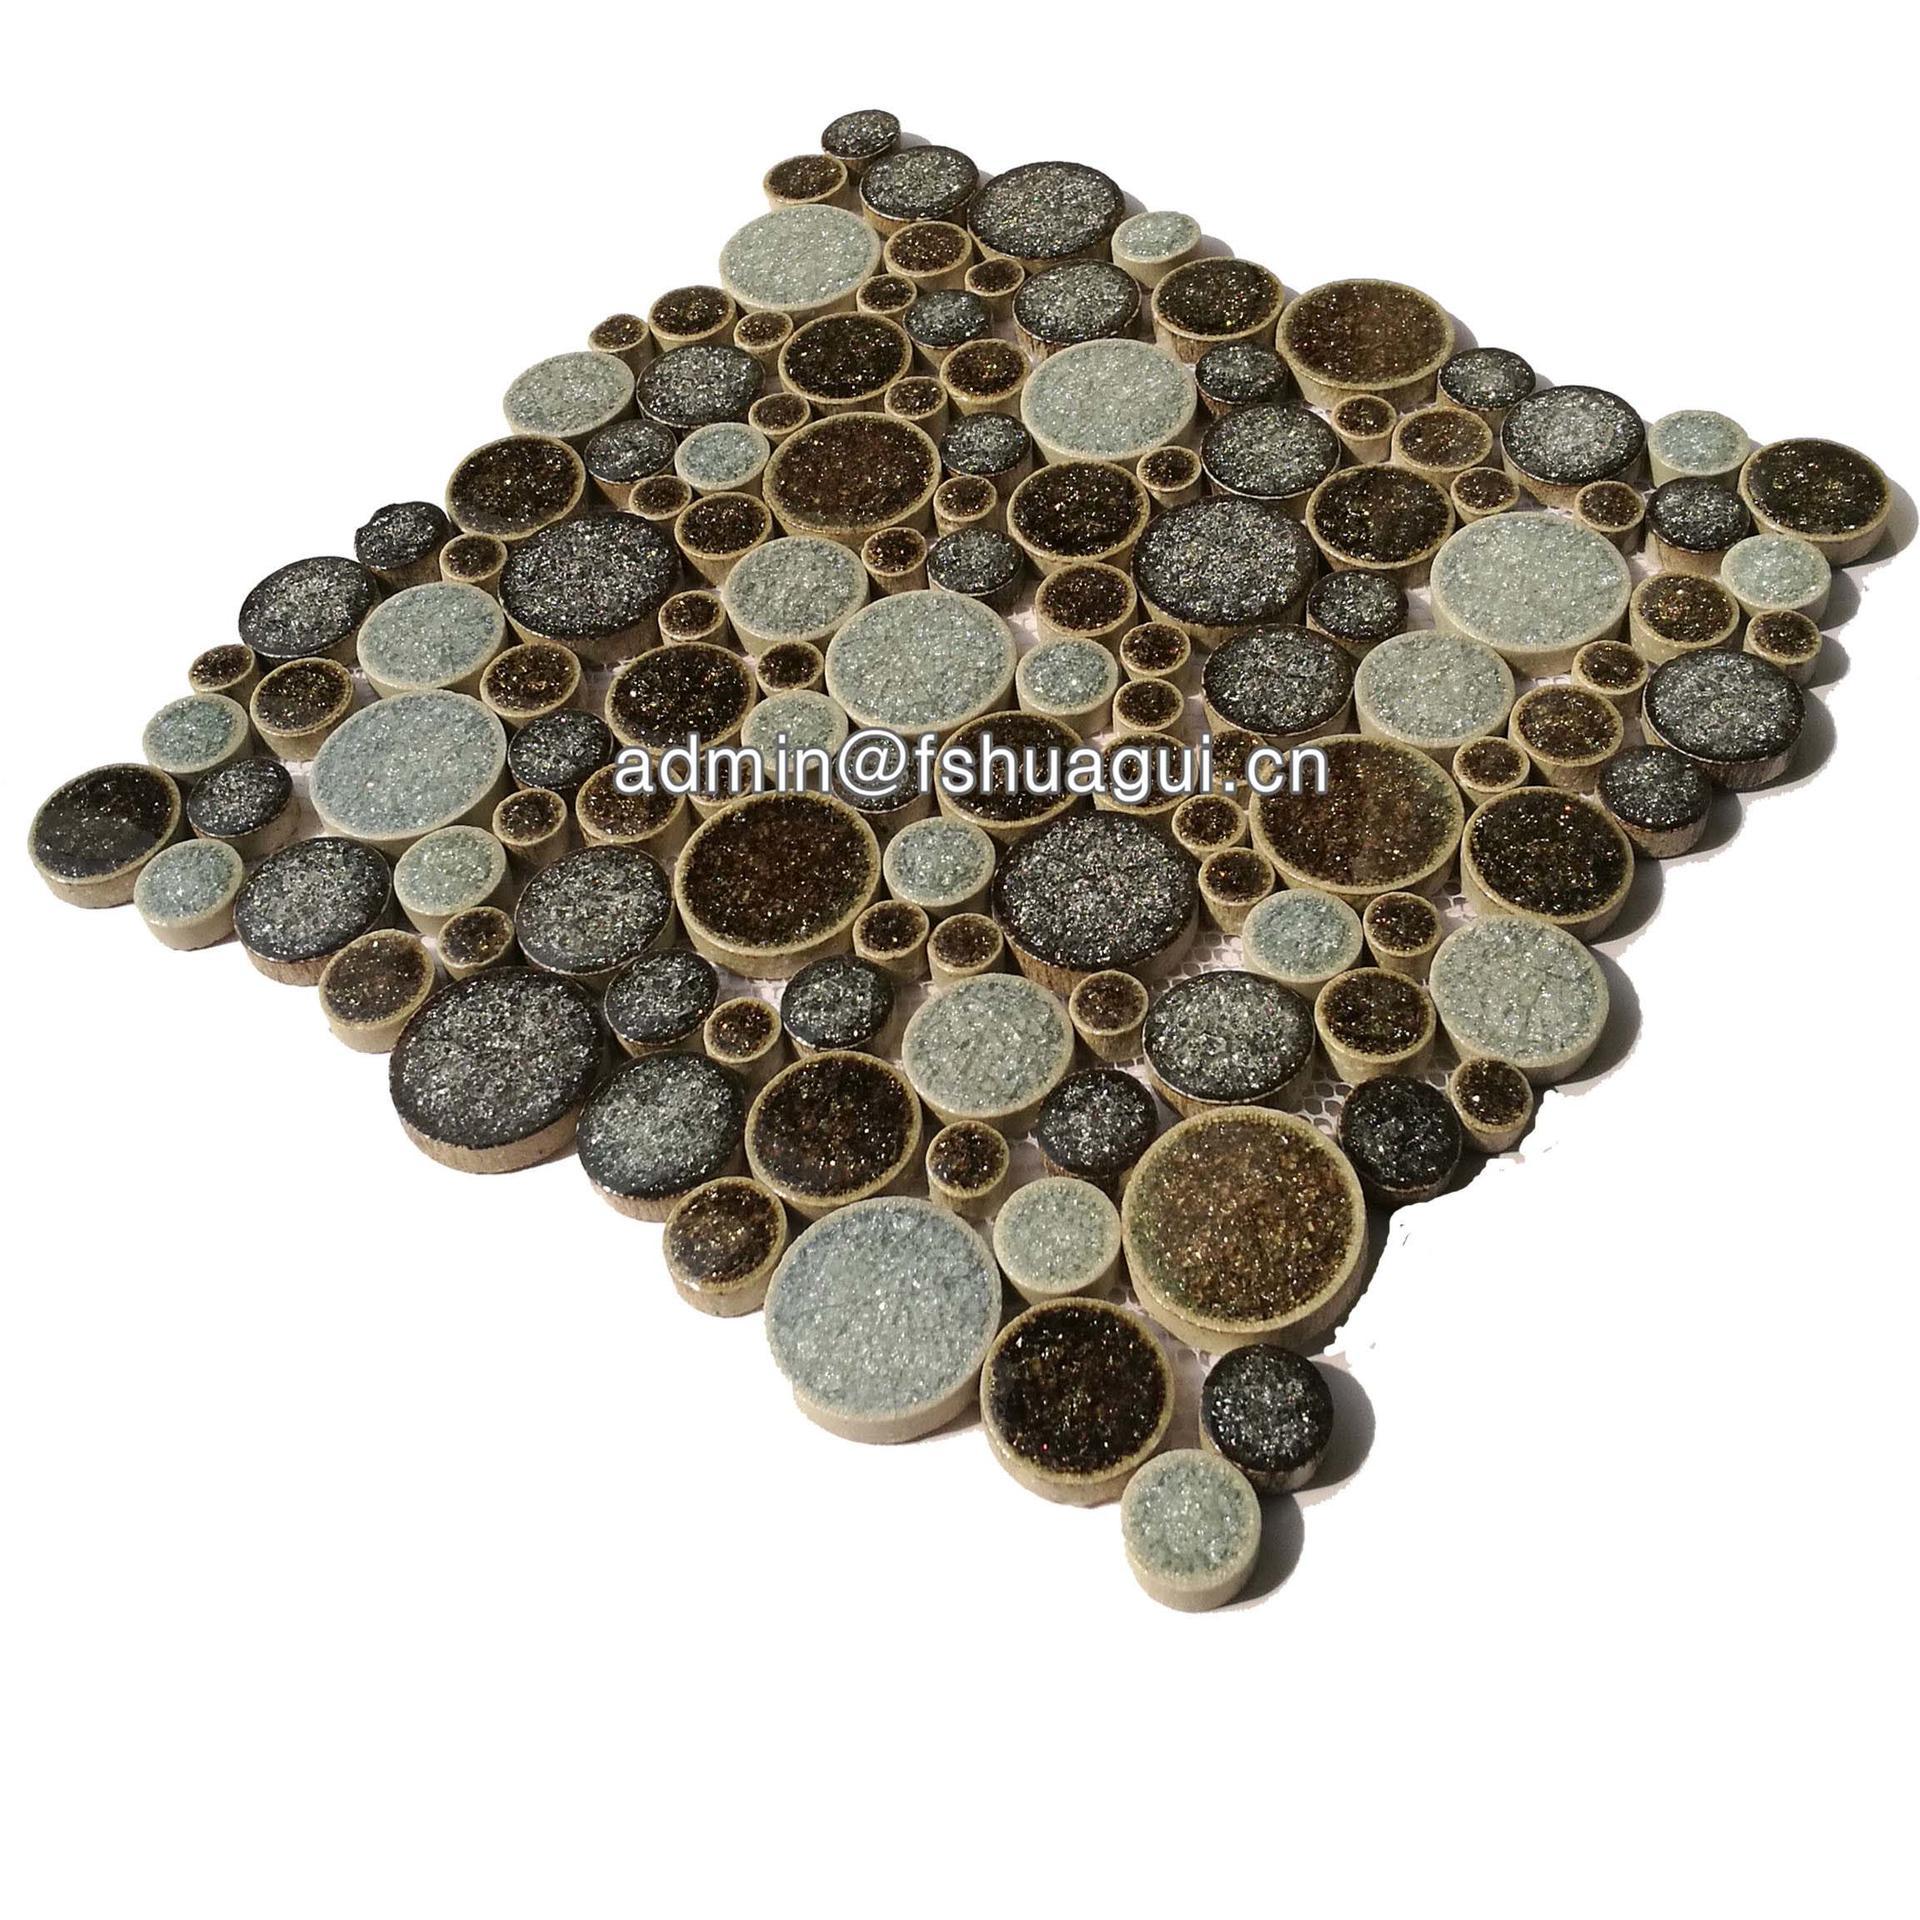 Foshan brown pebble ceramic mosaic bathroom floor tiles